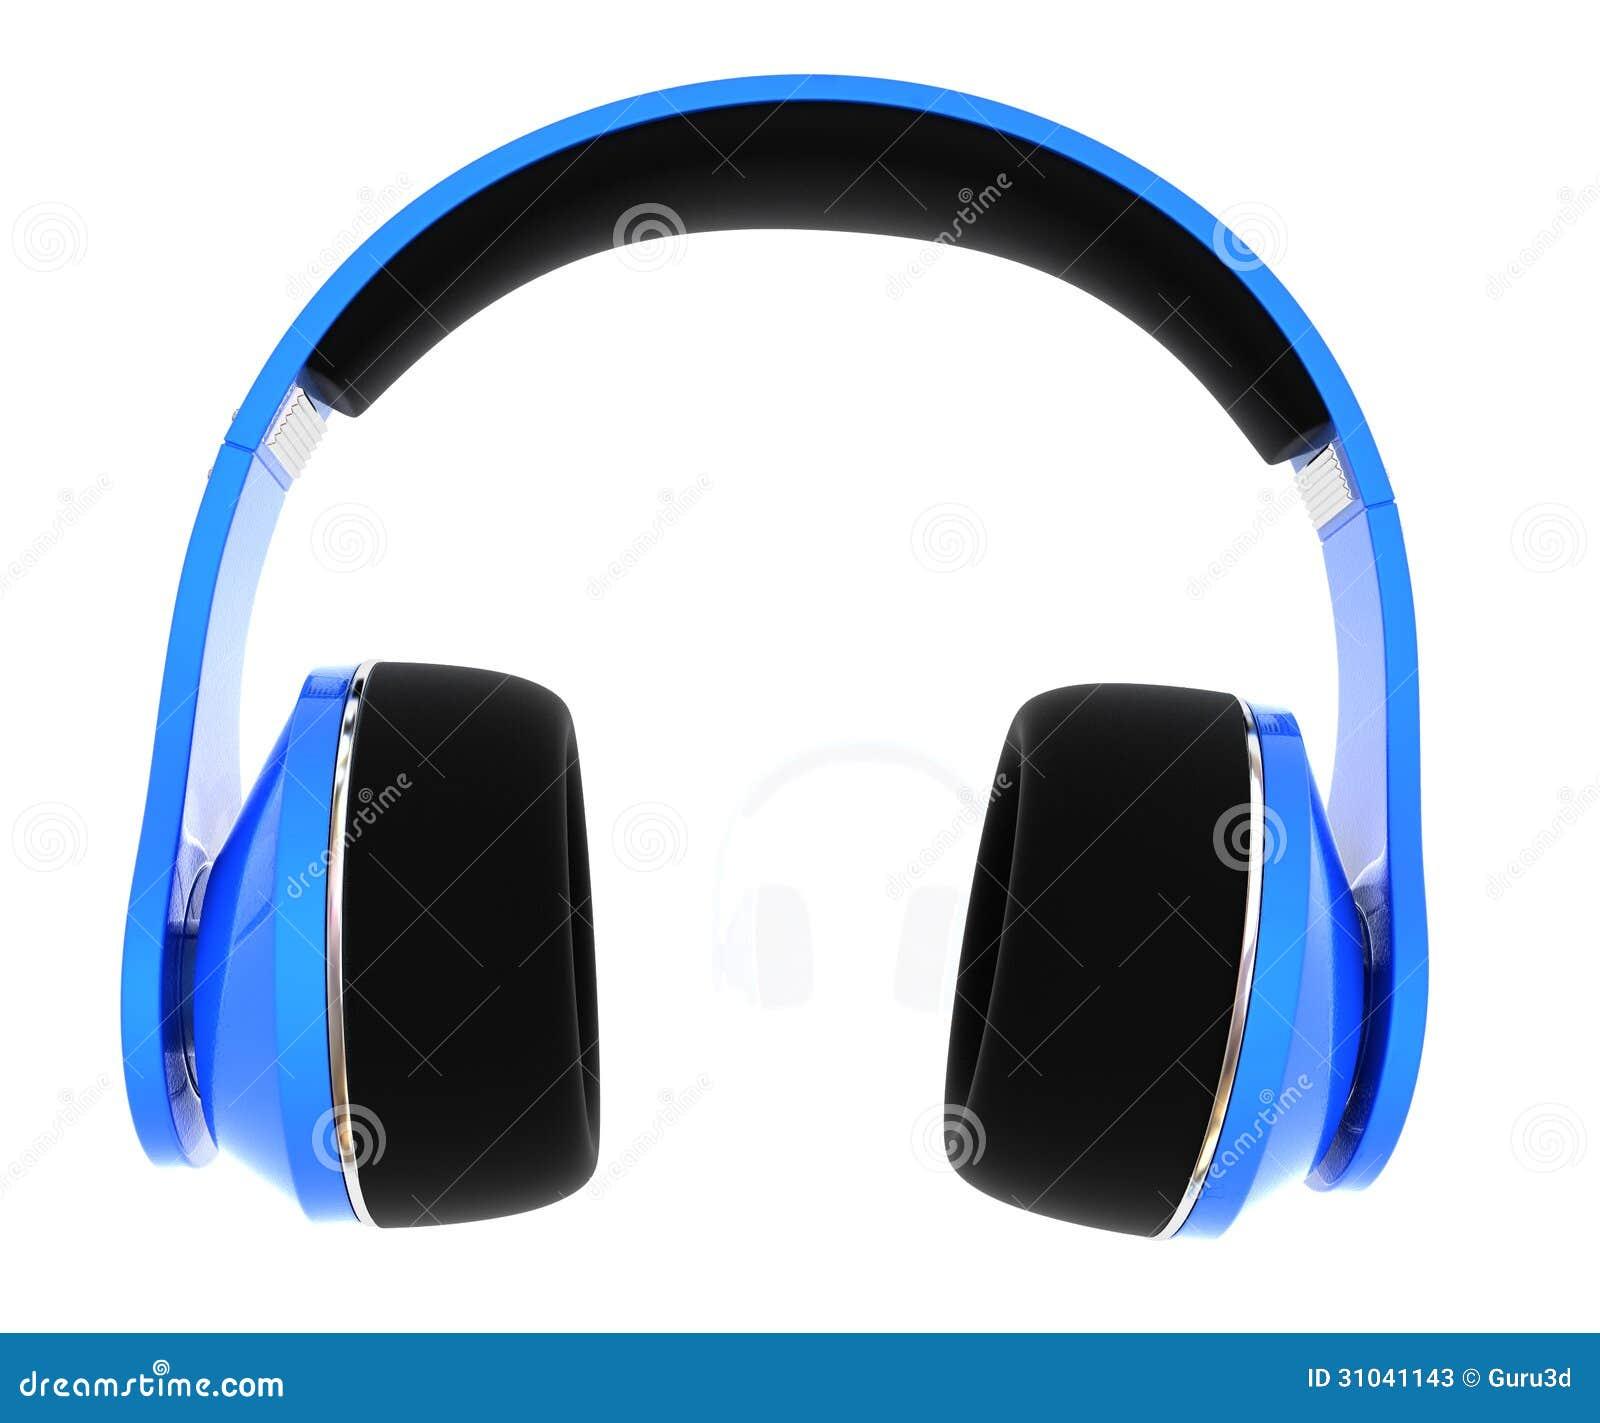 3d illustration of blue headphones isolated on white background stock